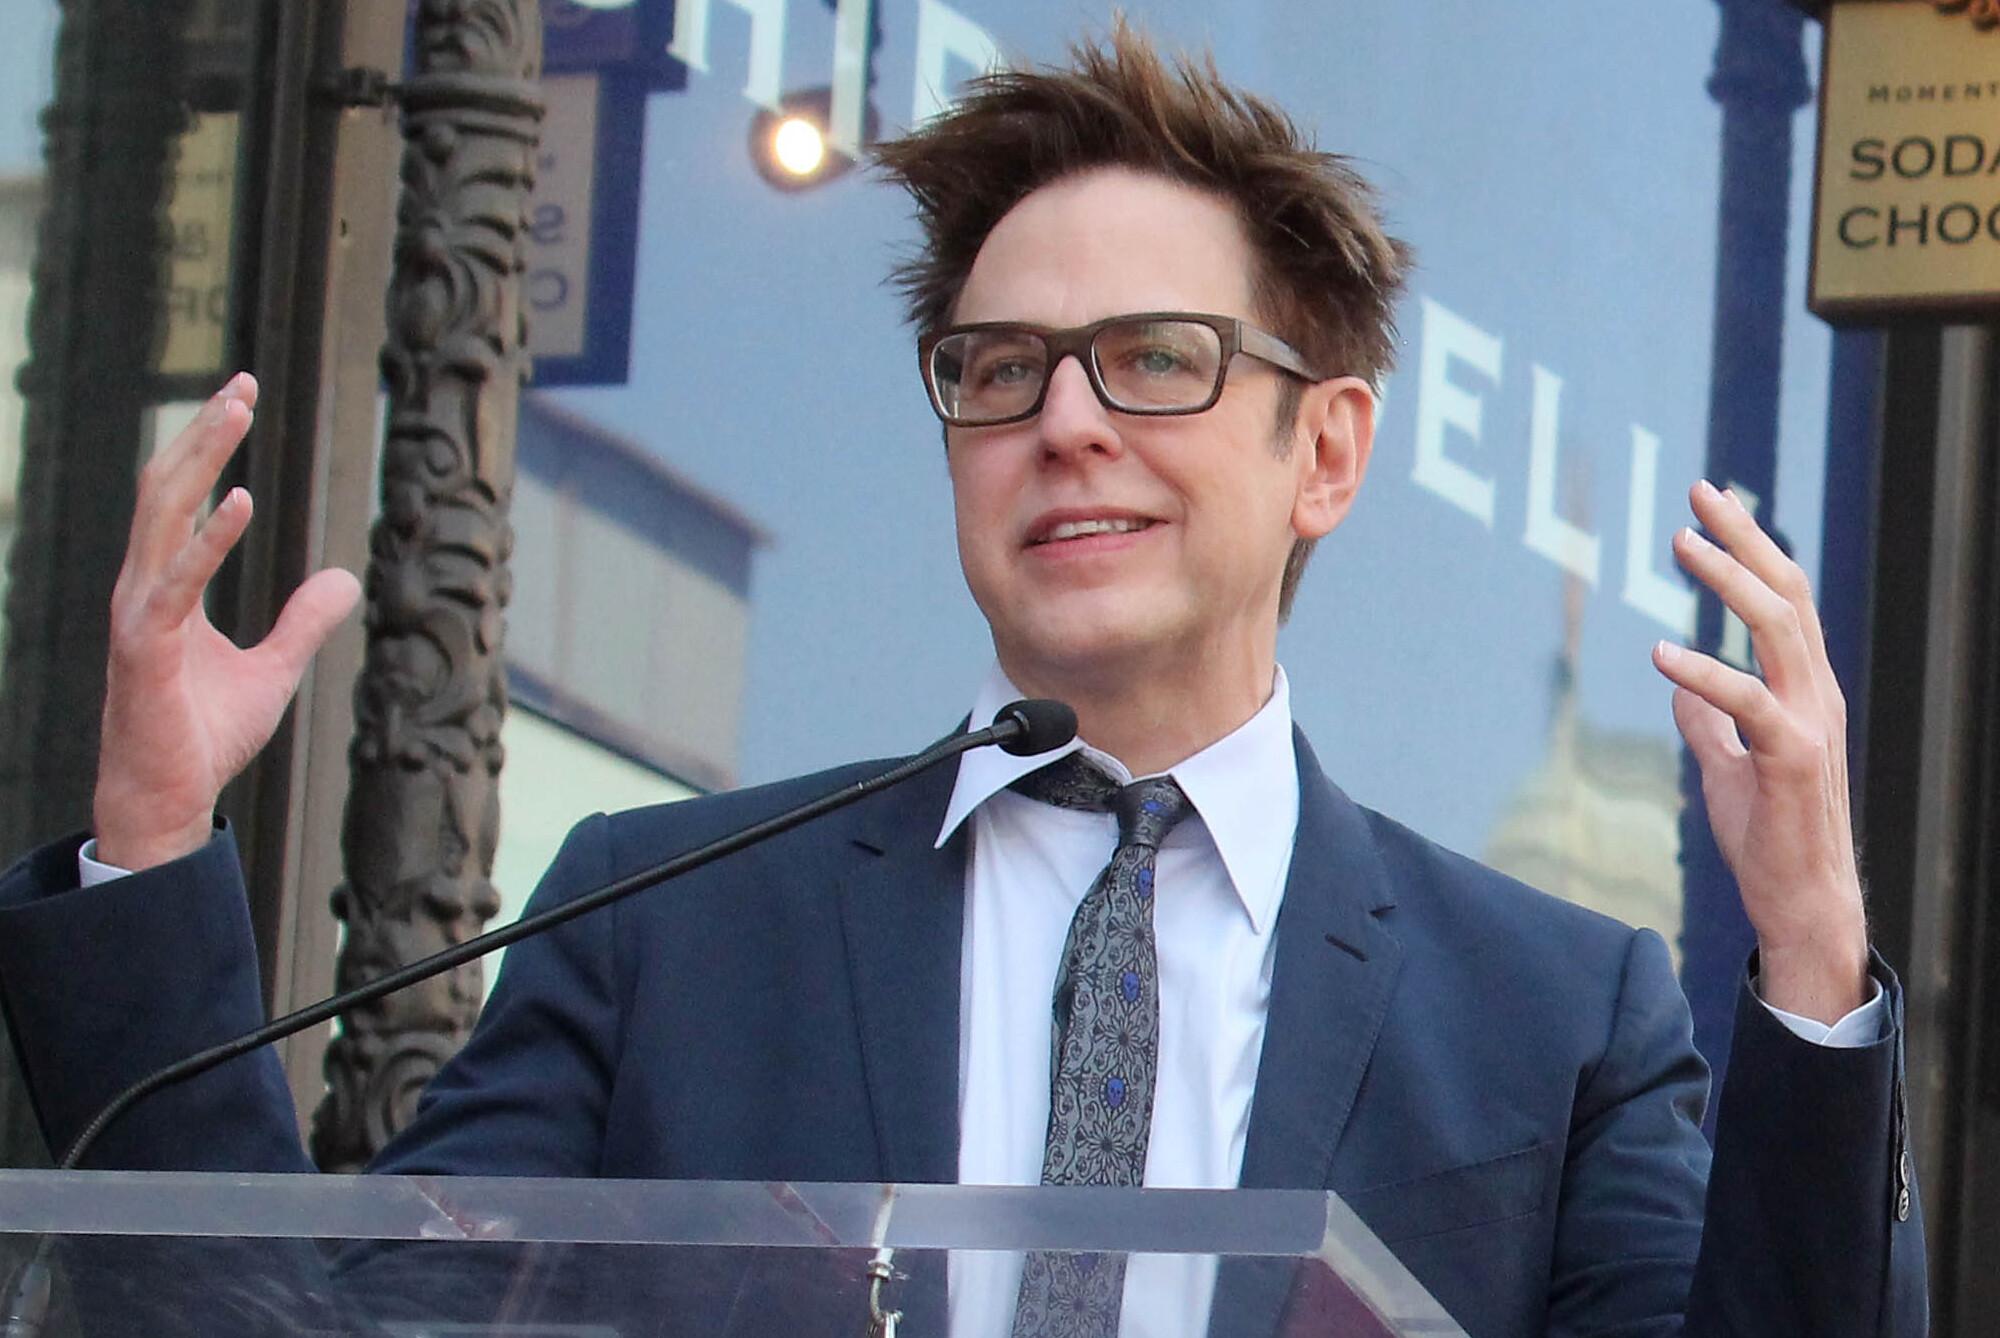 Джеймс Ганн заявил, что работа над фильмом «Отряд самоубийц 2» скоро будет завершена